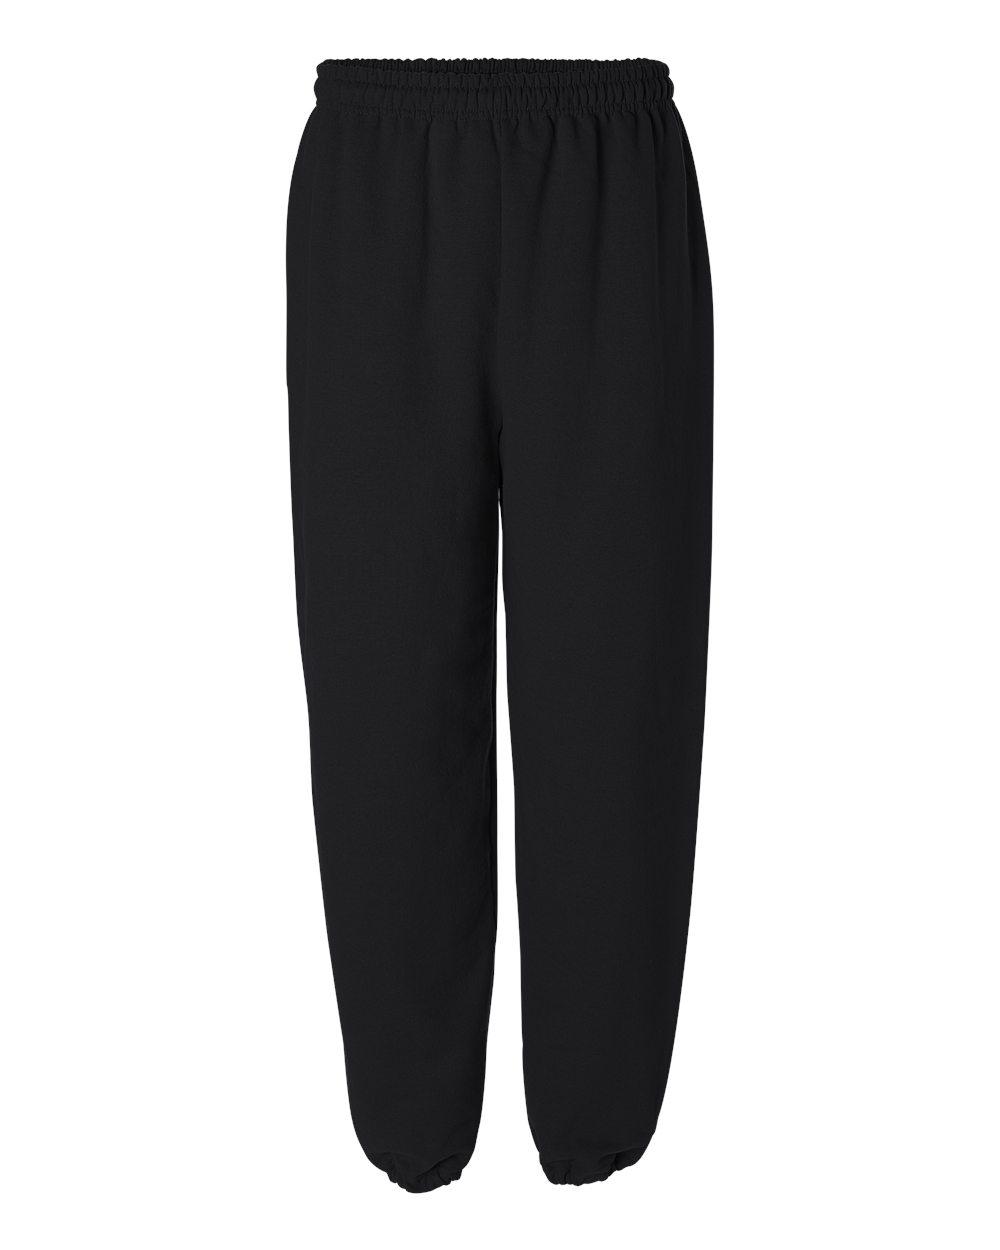 Gildan-Mens-Heavy-Blend-Sweatpants-18200-up-to-2XL thumbnail 9